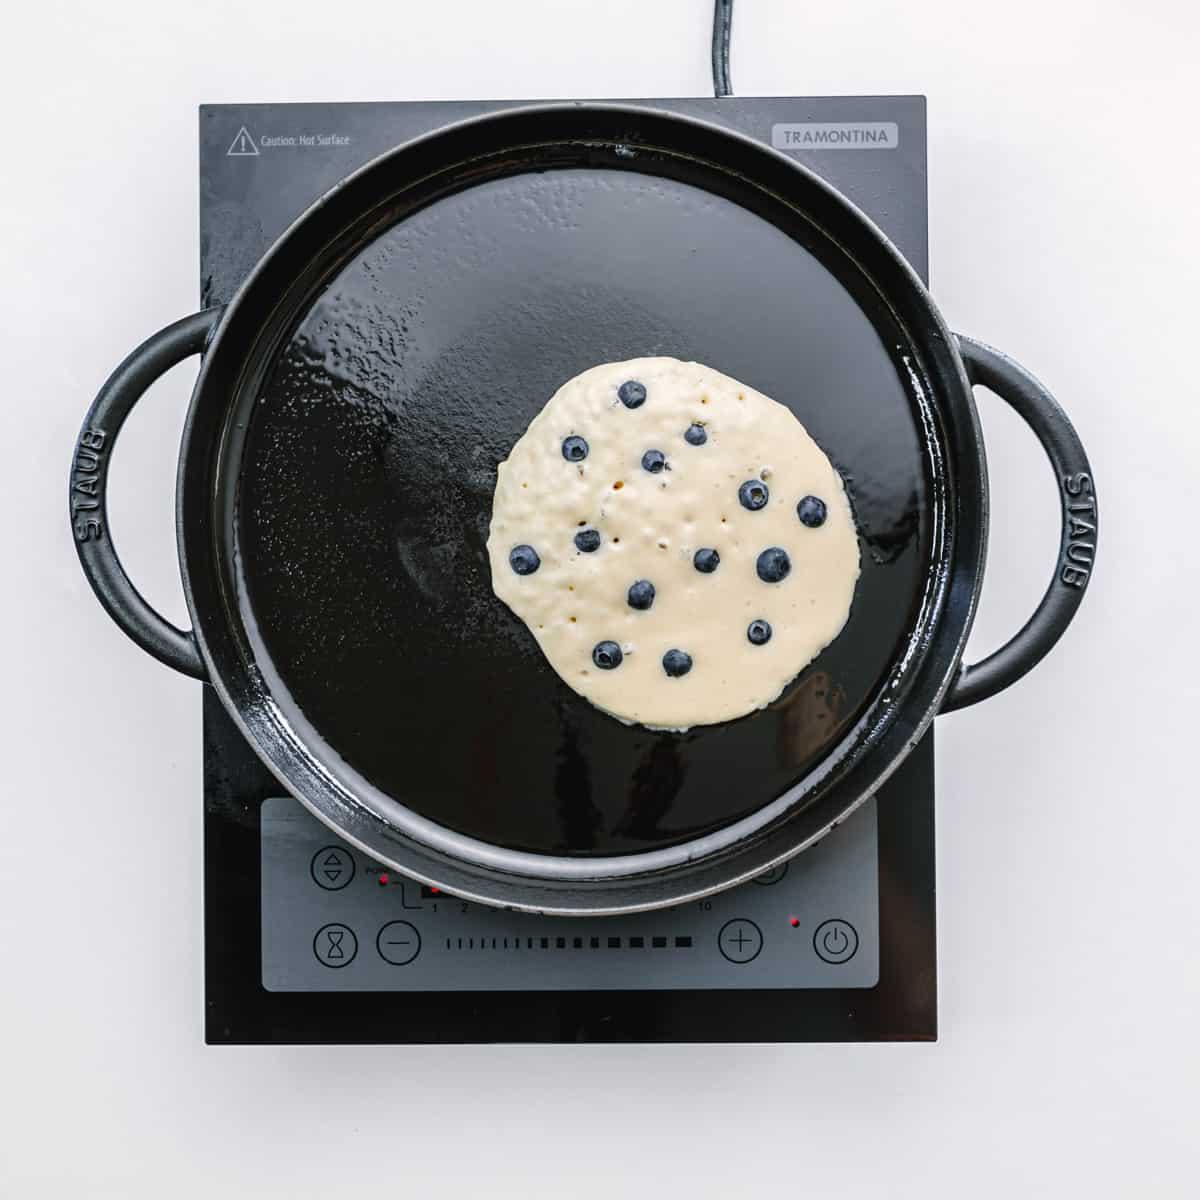 Fluffy blueberry pancakes